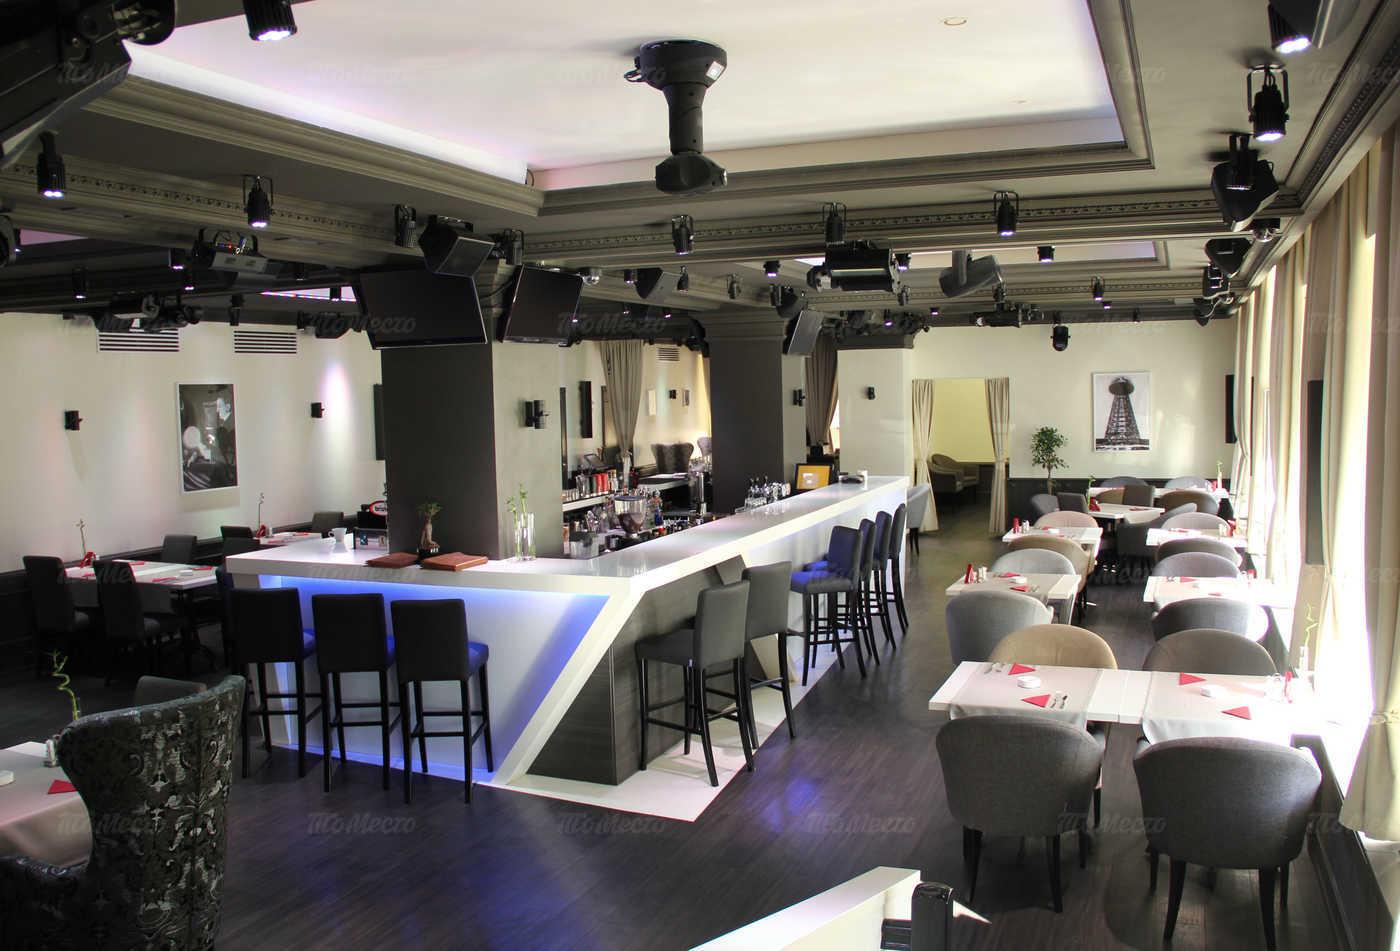 Меню бара, караоке клуба, ресторана Никола Тесла (Н. Тесла) на Шарикоподшипниковской улице